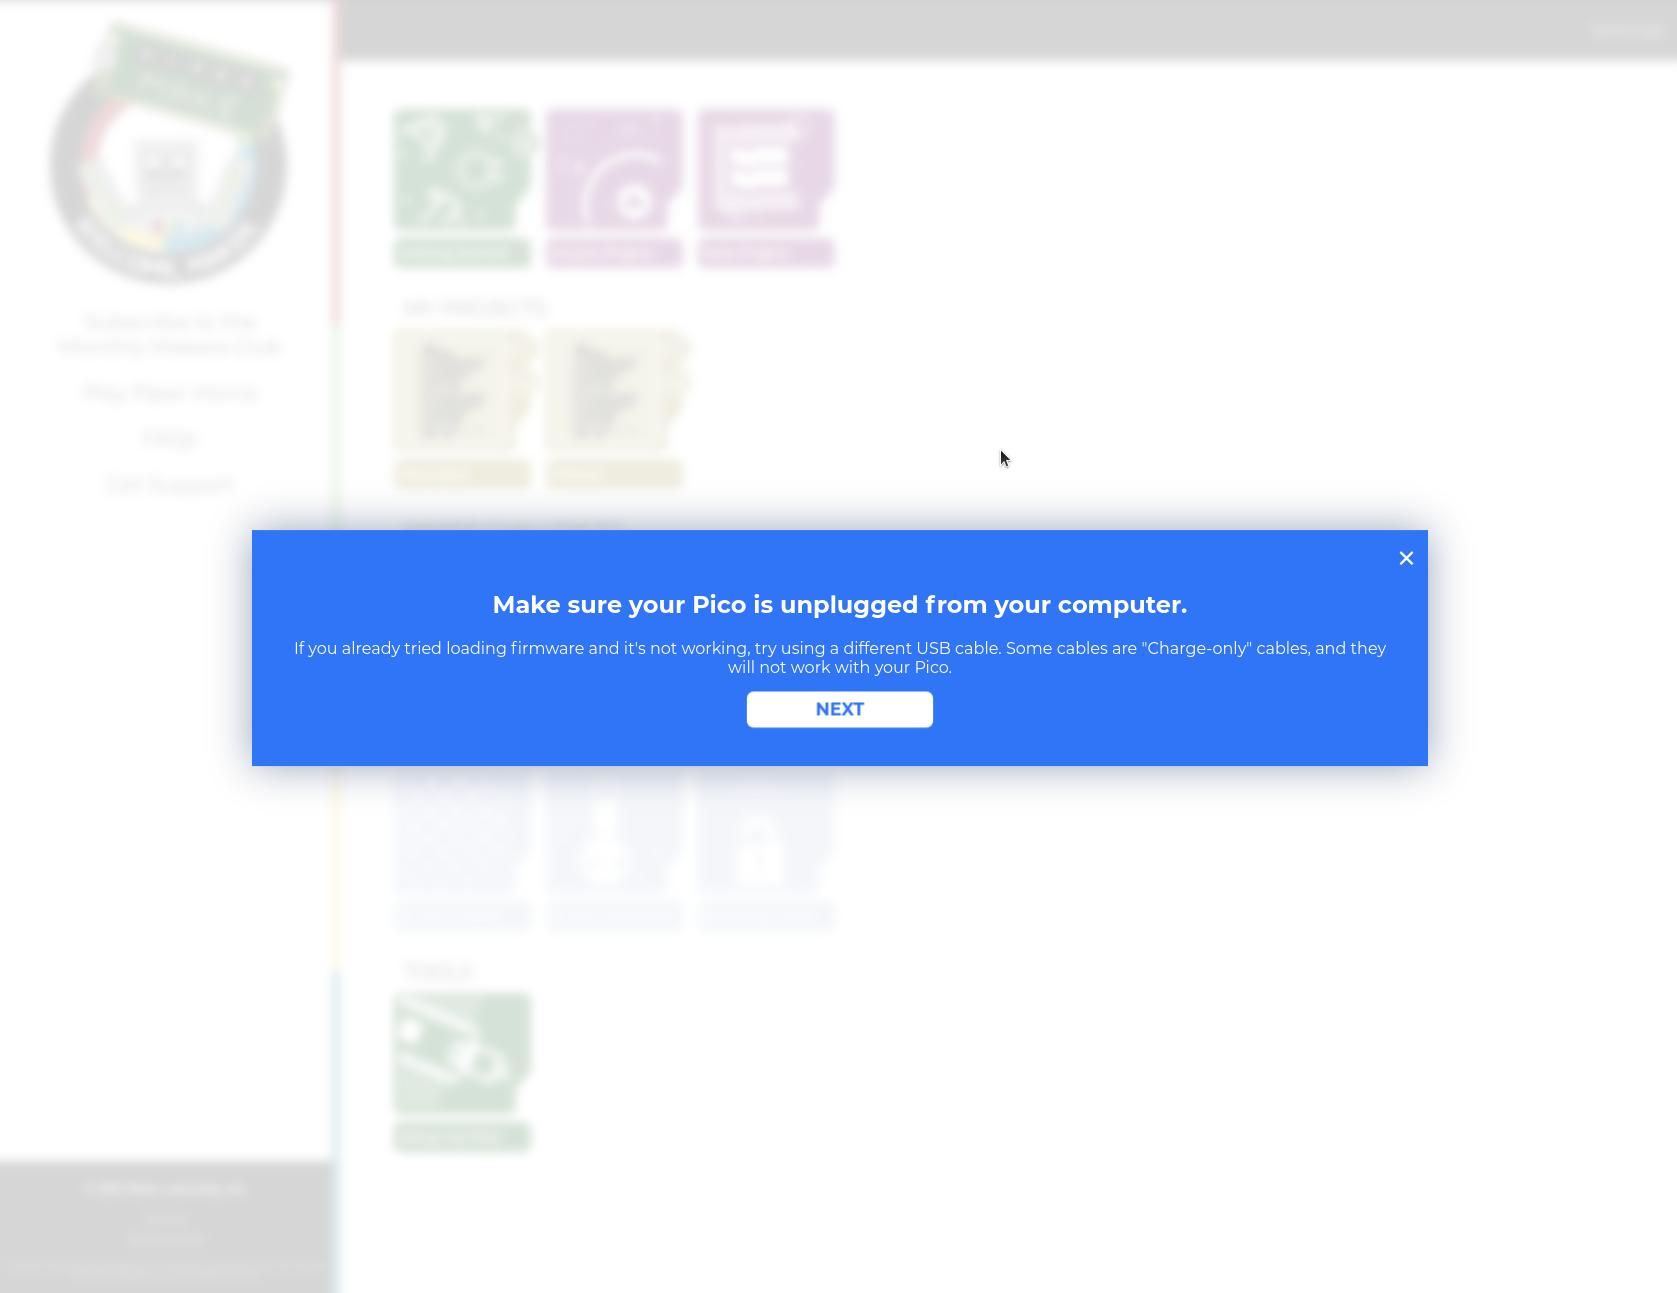 raspberry_pi_Screenshot_from_2021-04-16_17-04-28.png